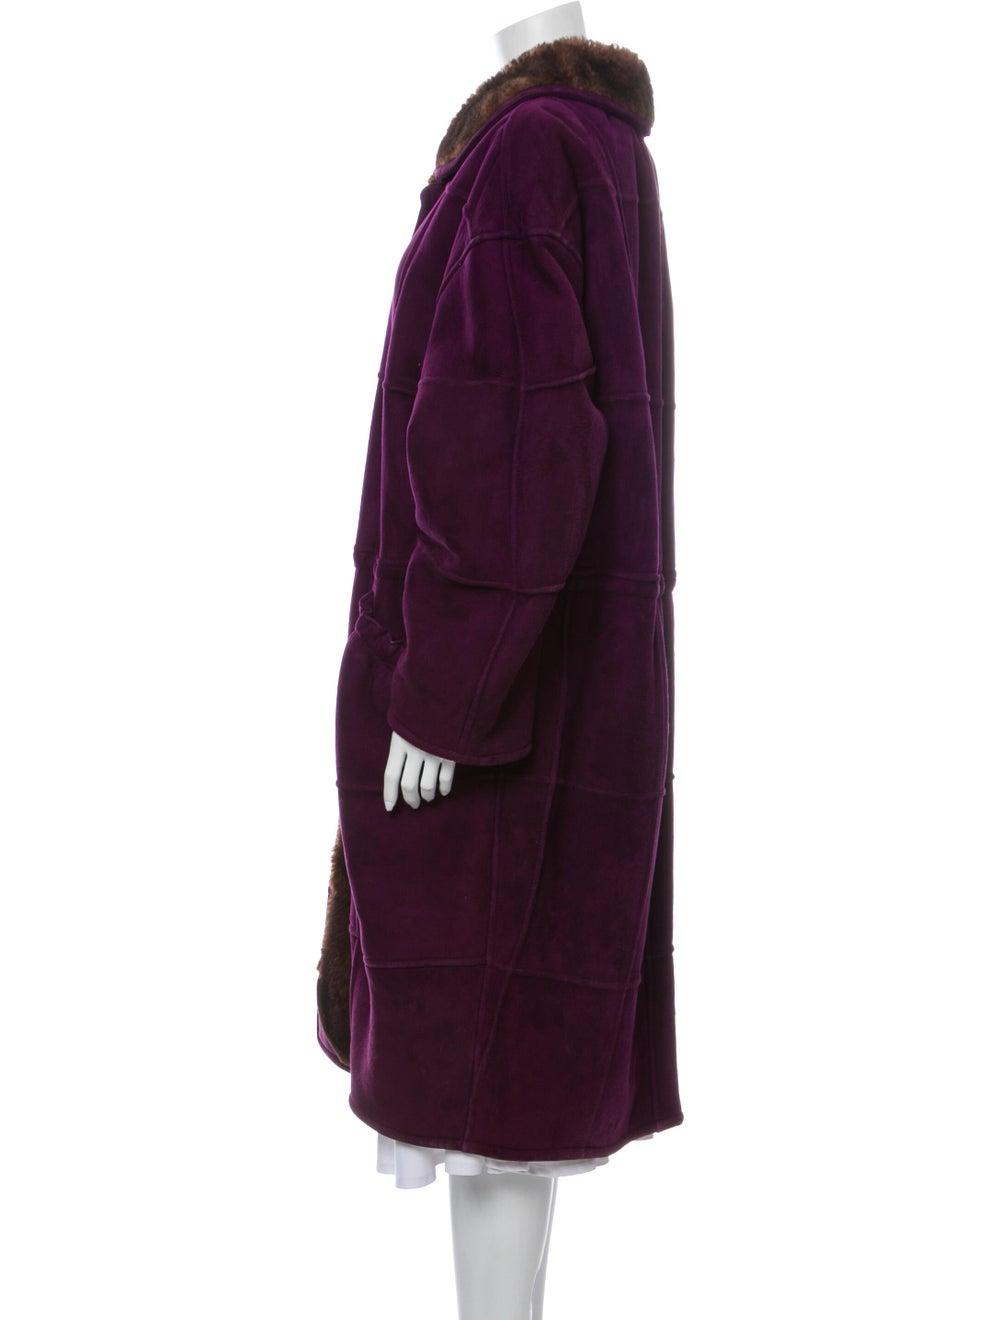 Krizia Coat Purple - image 2